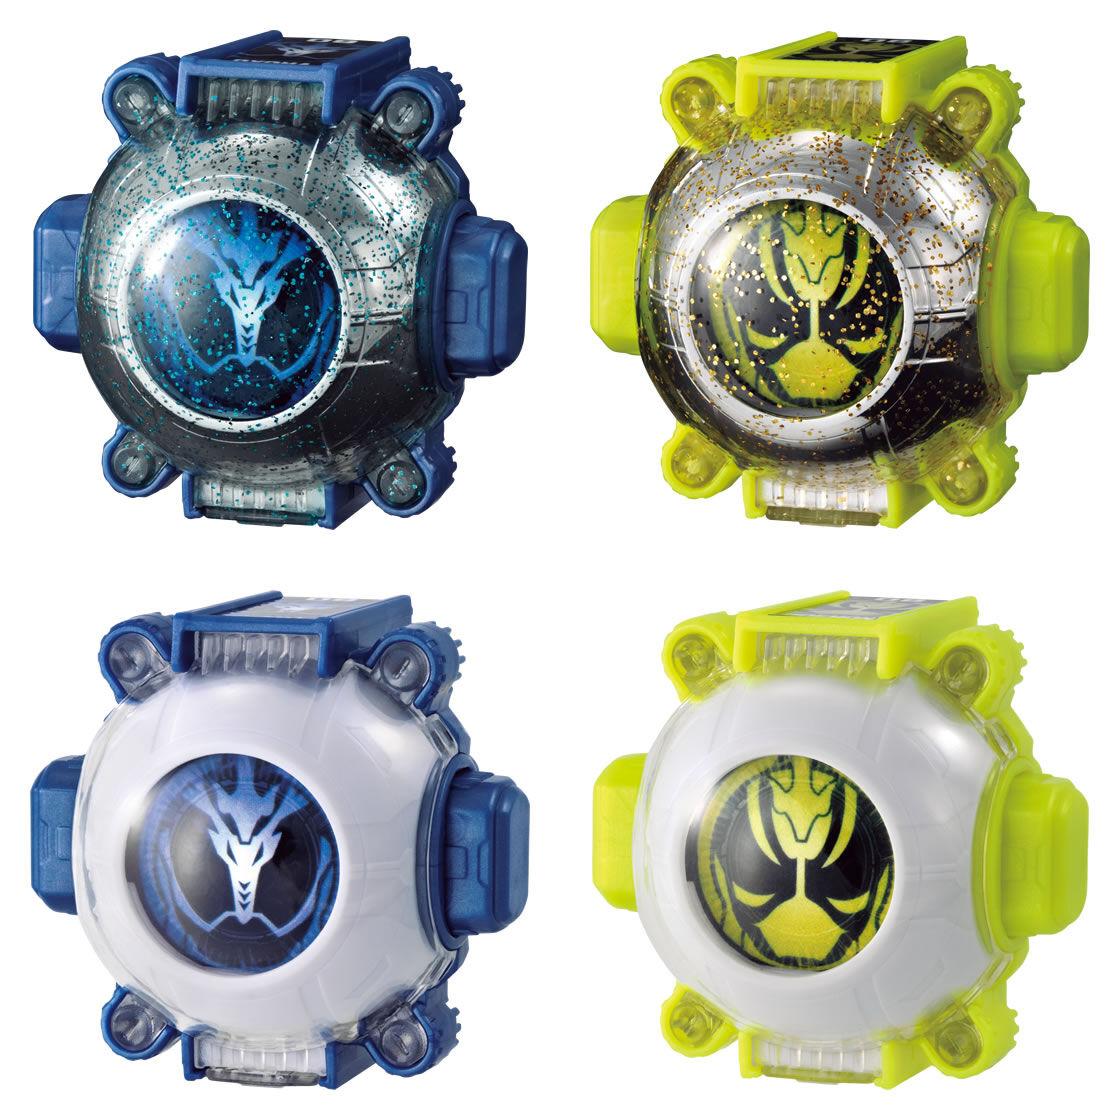 RARE   Bandai Masked Kamen Rider Ghost Gashapon Ghost eyecon 07 4 kinds of sets